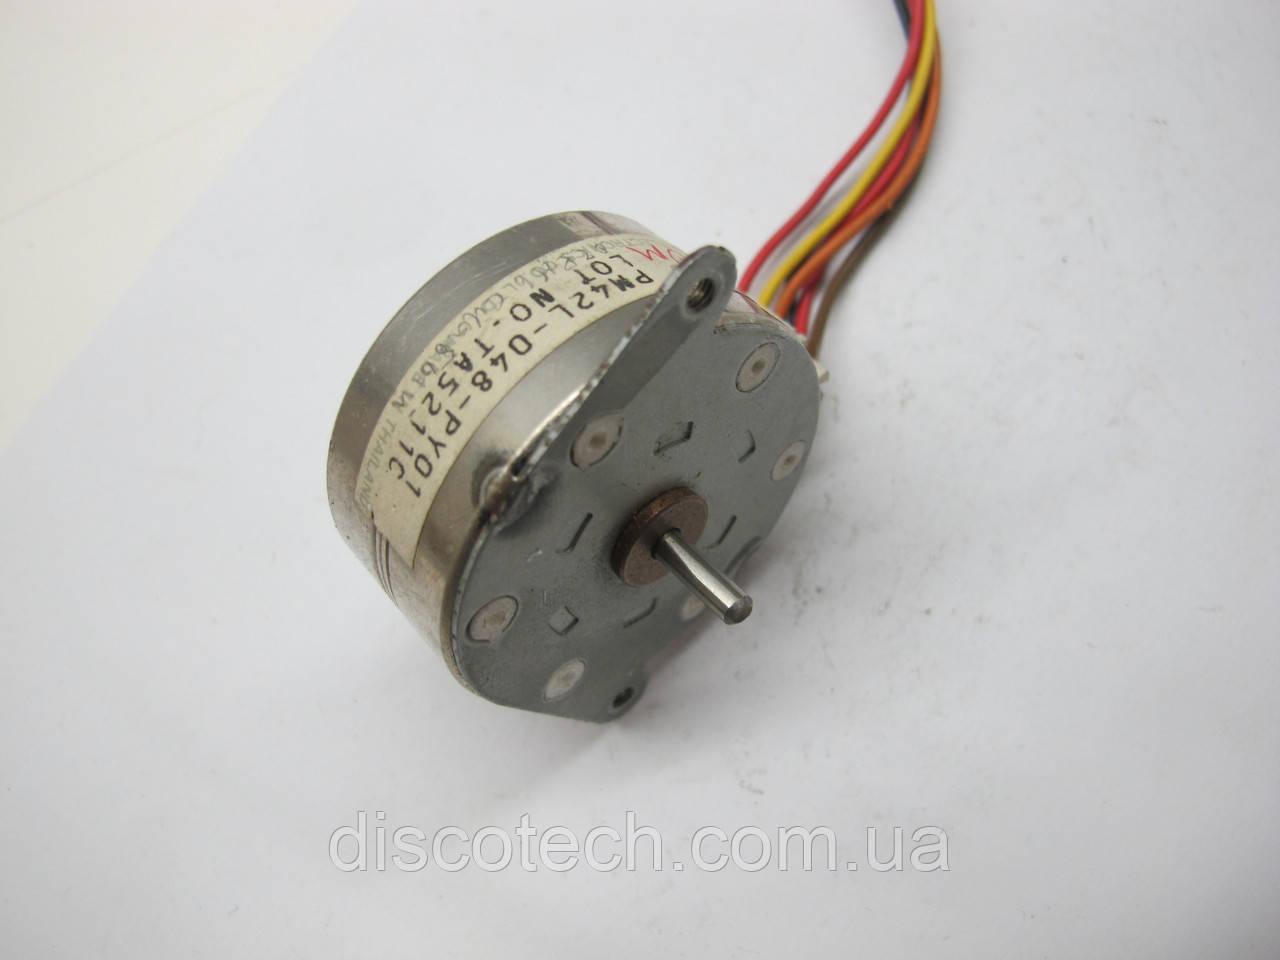 Двигатель шаговый уп 7,5 ф3,0/115 Ом PM42L-048-PY01